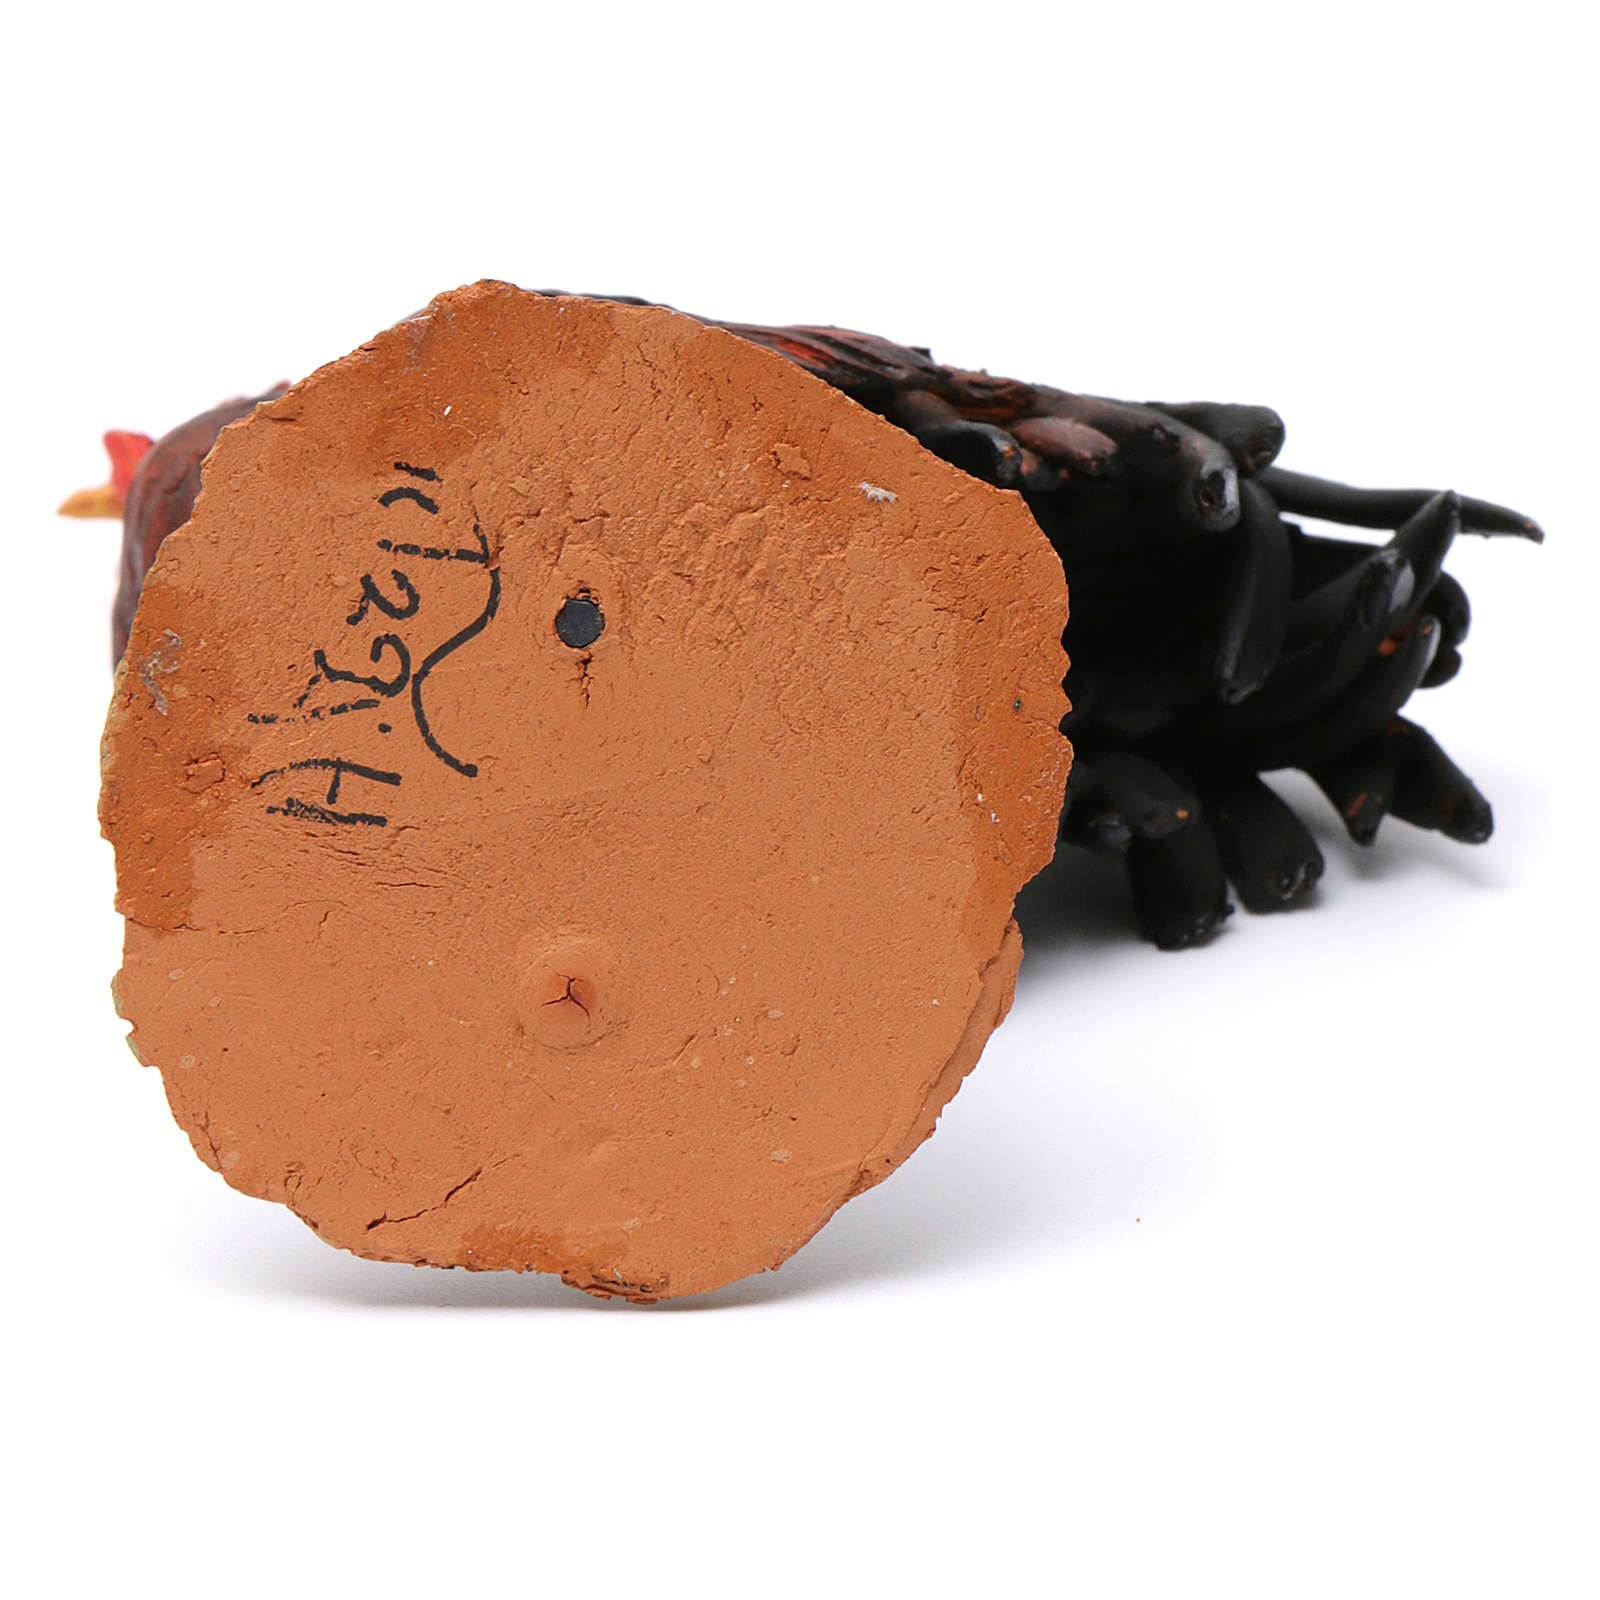 Gallo terracotta per presepe 30 cm Tripi 4